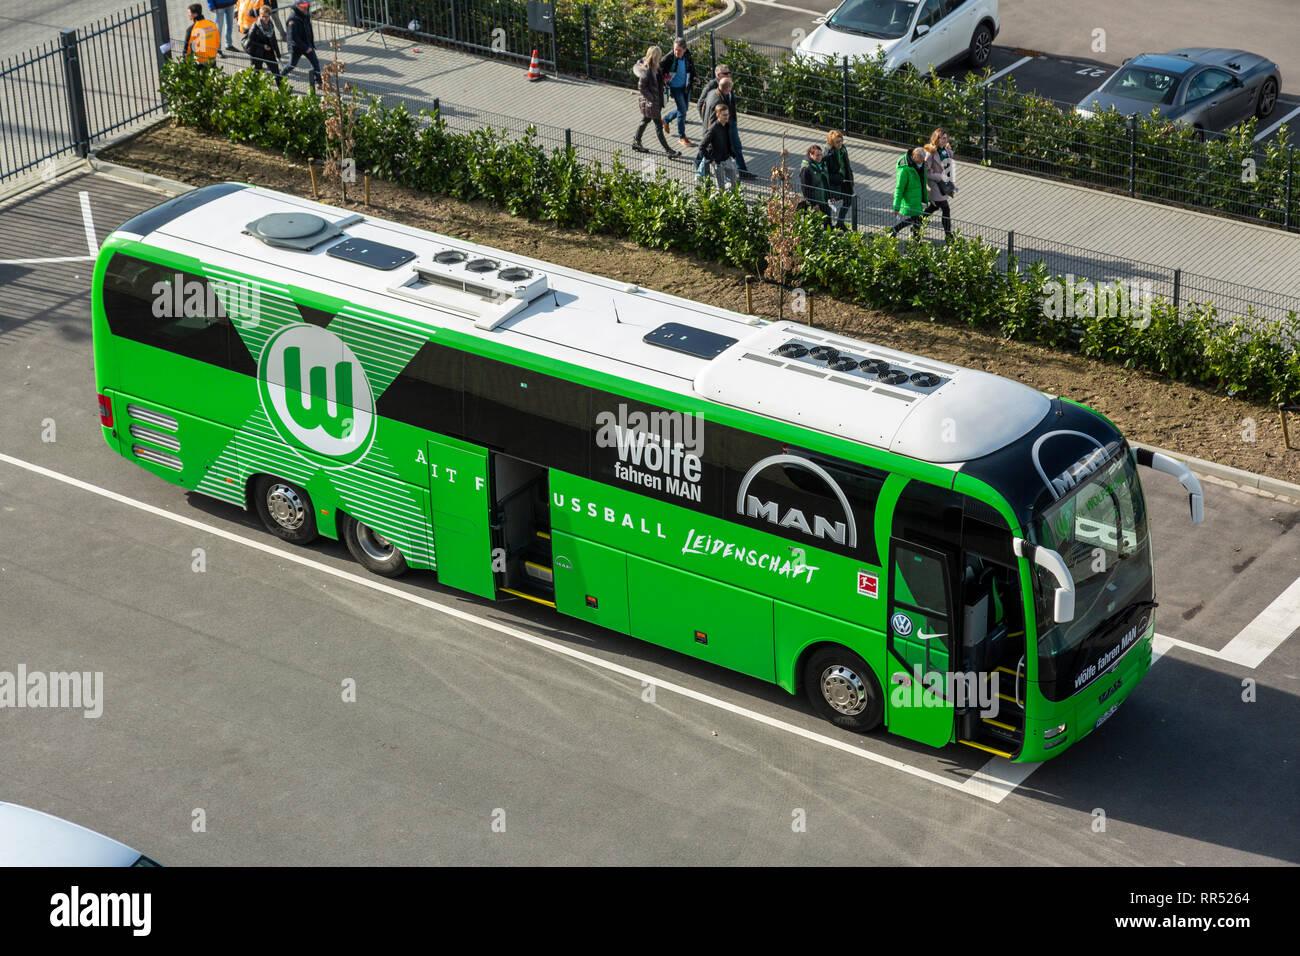 sports, football, Bundesliga, 2018/2019, Borussia Moenchengladbach vs VfL Wolfsburg 0-3, Stadium Borussia Park, team bus of Wolfsburg, DFL REGULATIONS PROHIBIT ANY USE OF PHOTOGRAPHS AS IMAGE SEQUENCES AND/OR QUASI-VIDEO - Stock Image